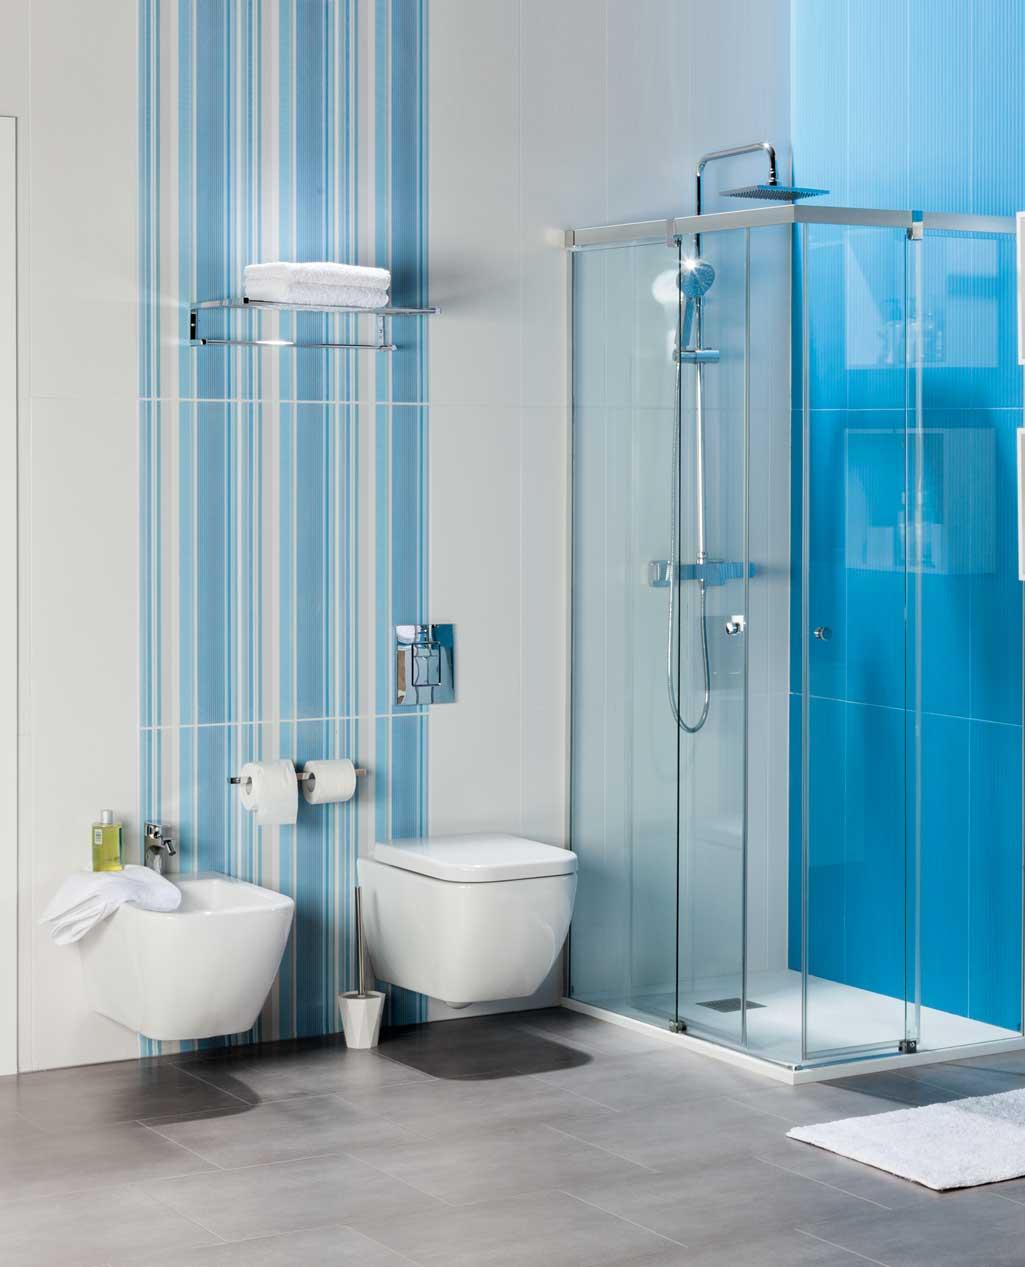 Baño Pequeno Azulejos Grandes O Pequenos:consejos para baños pequeños – Grup Gamma